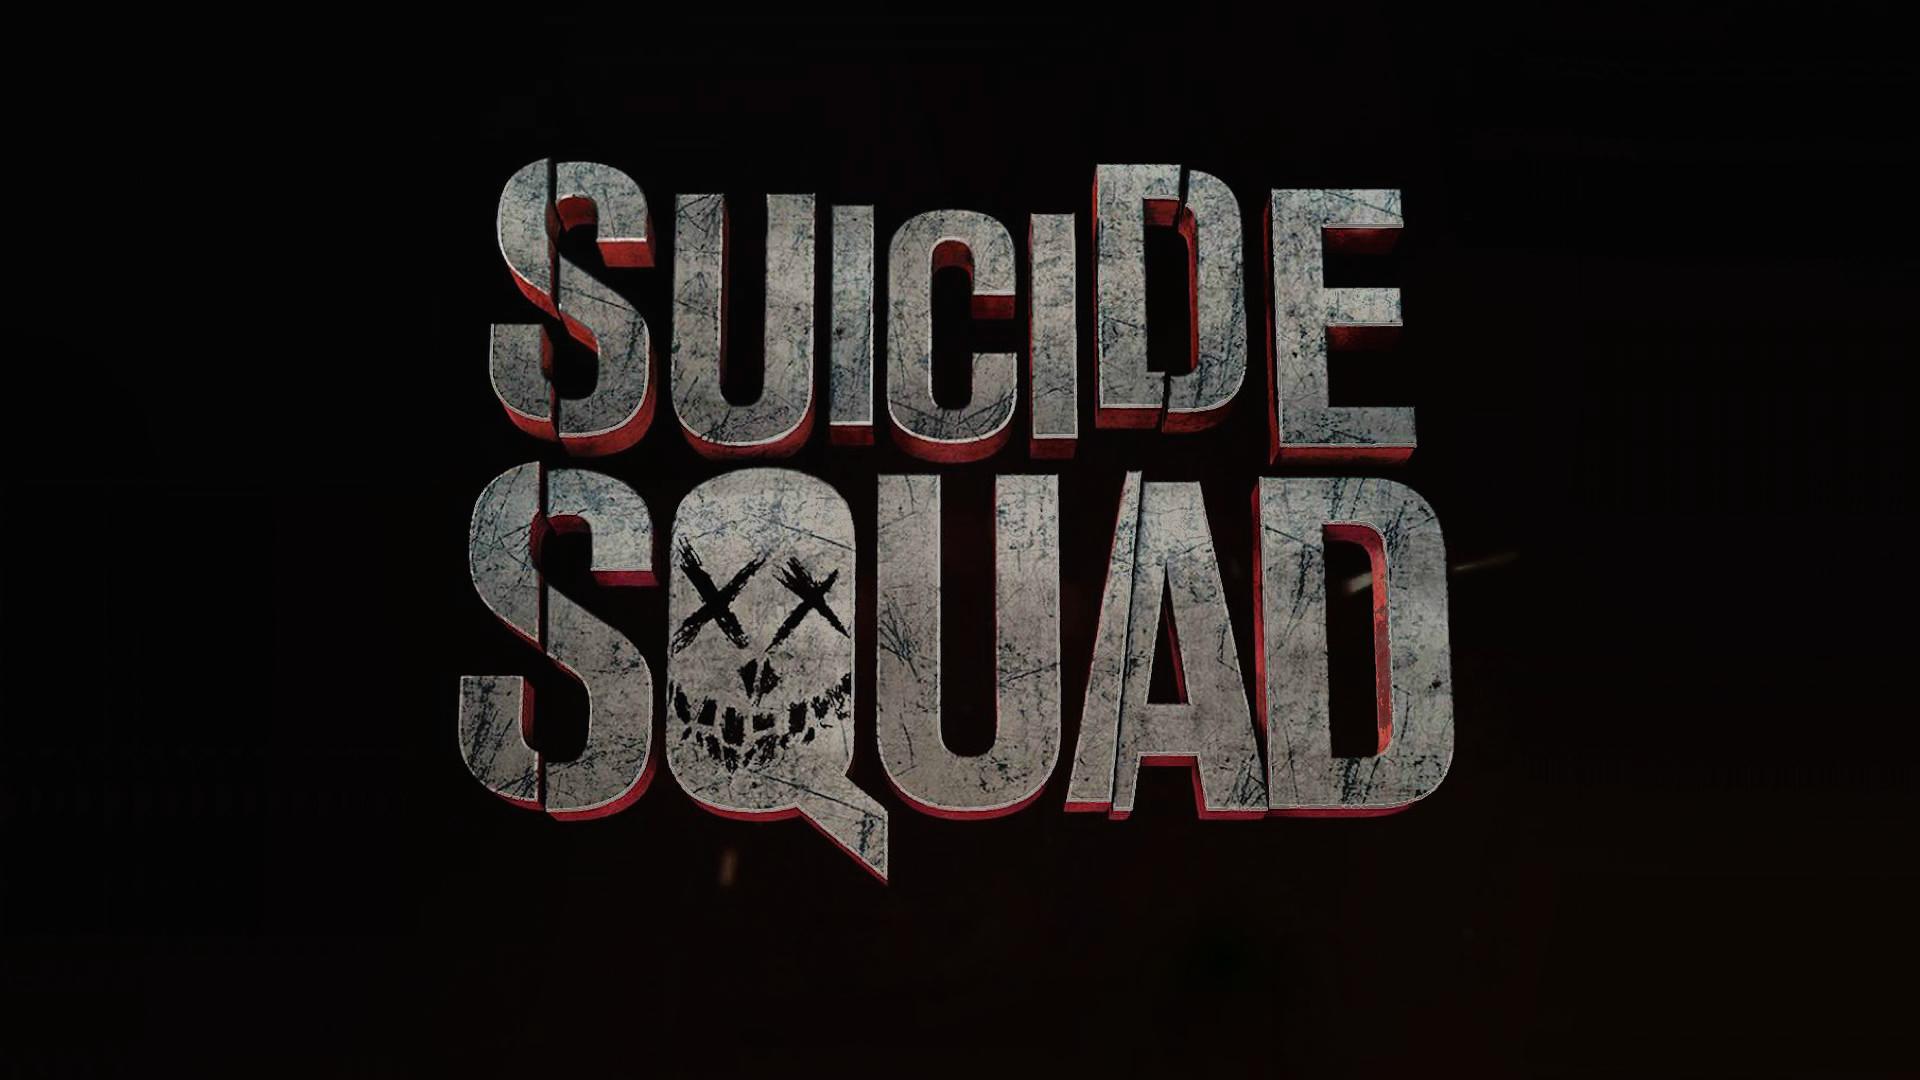 Suicide Squad Movies Images Photos Pictures Backgrounds 1920x1080